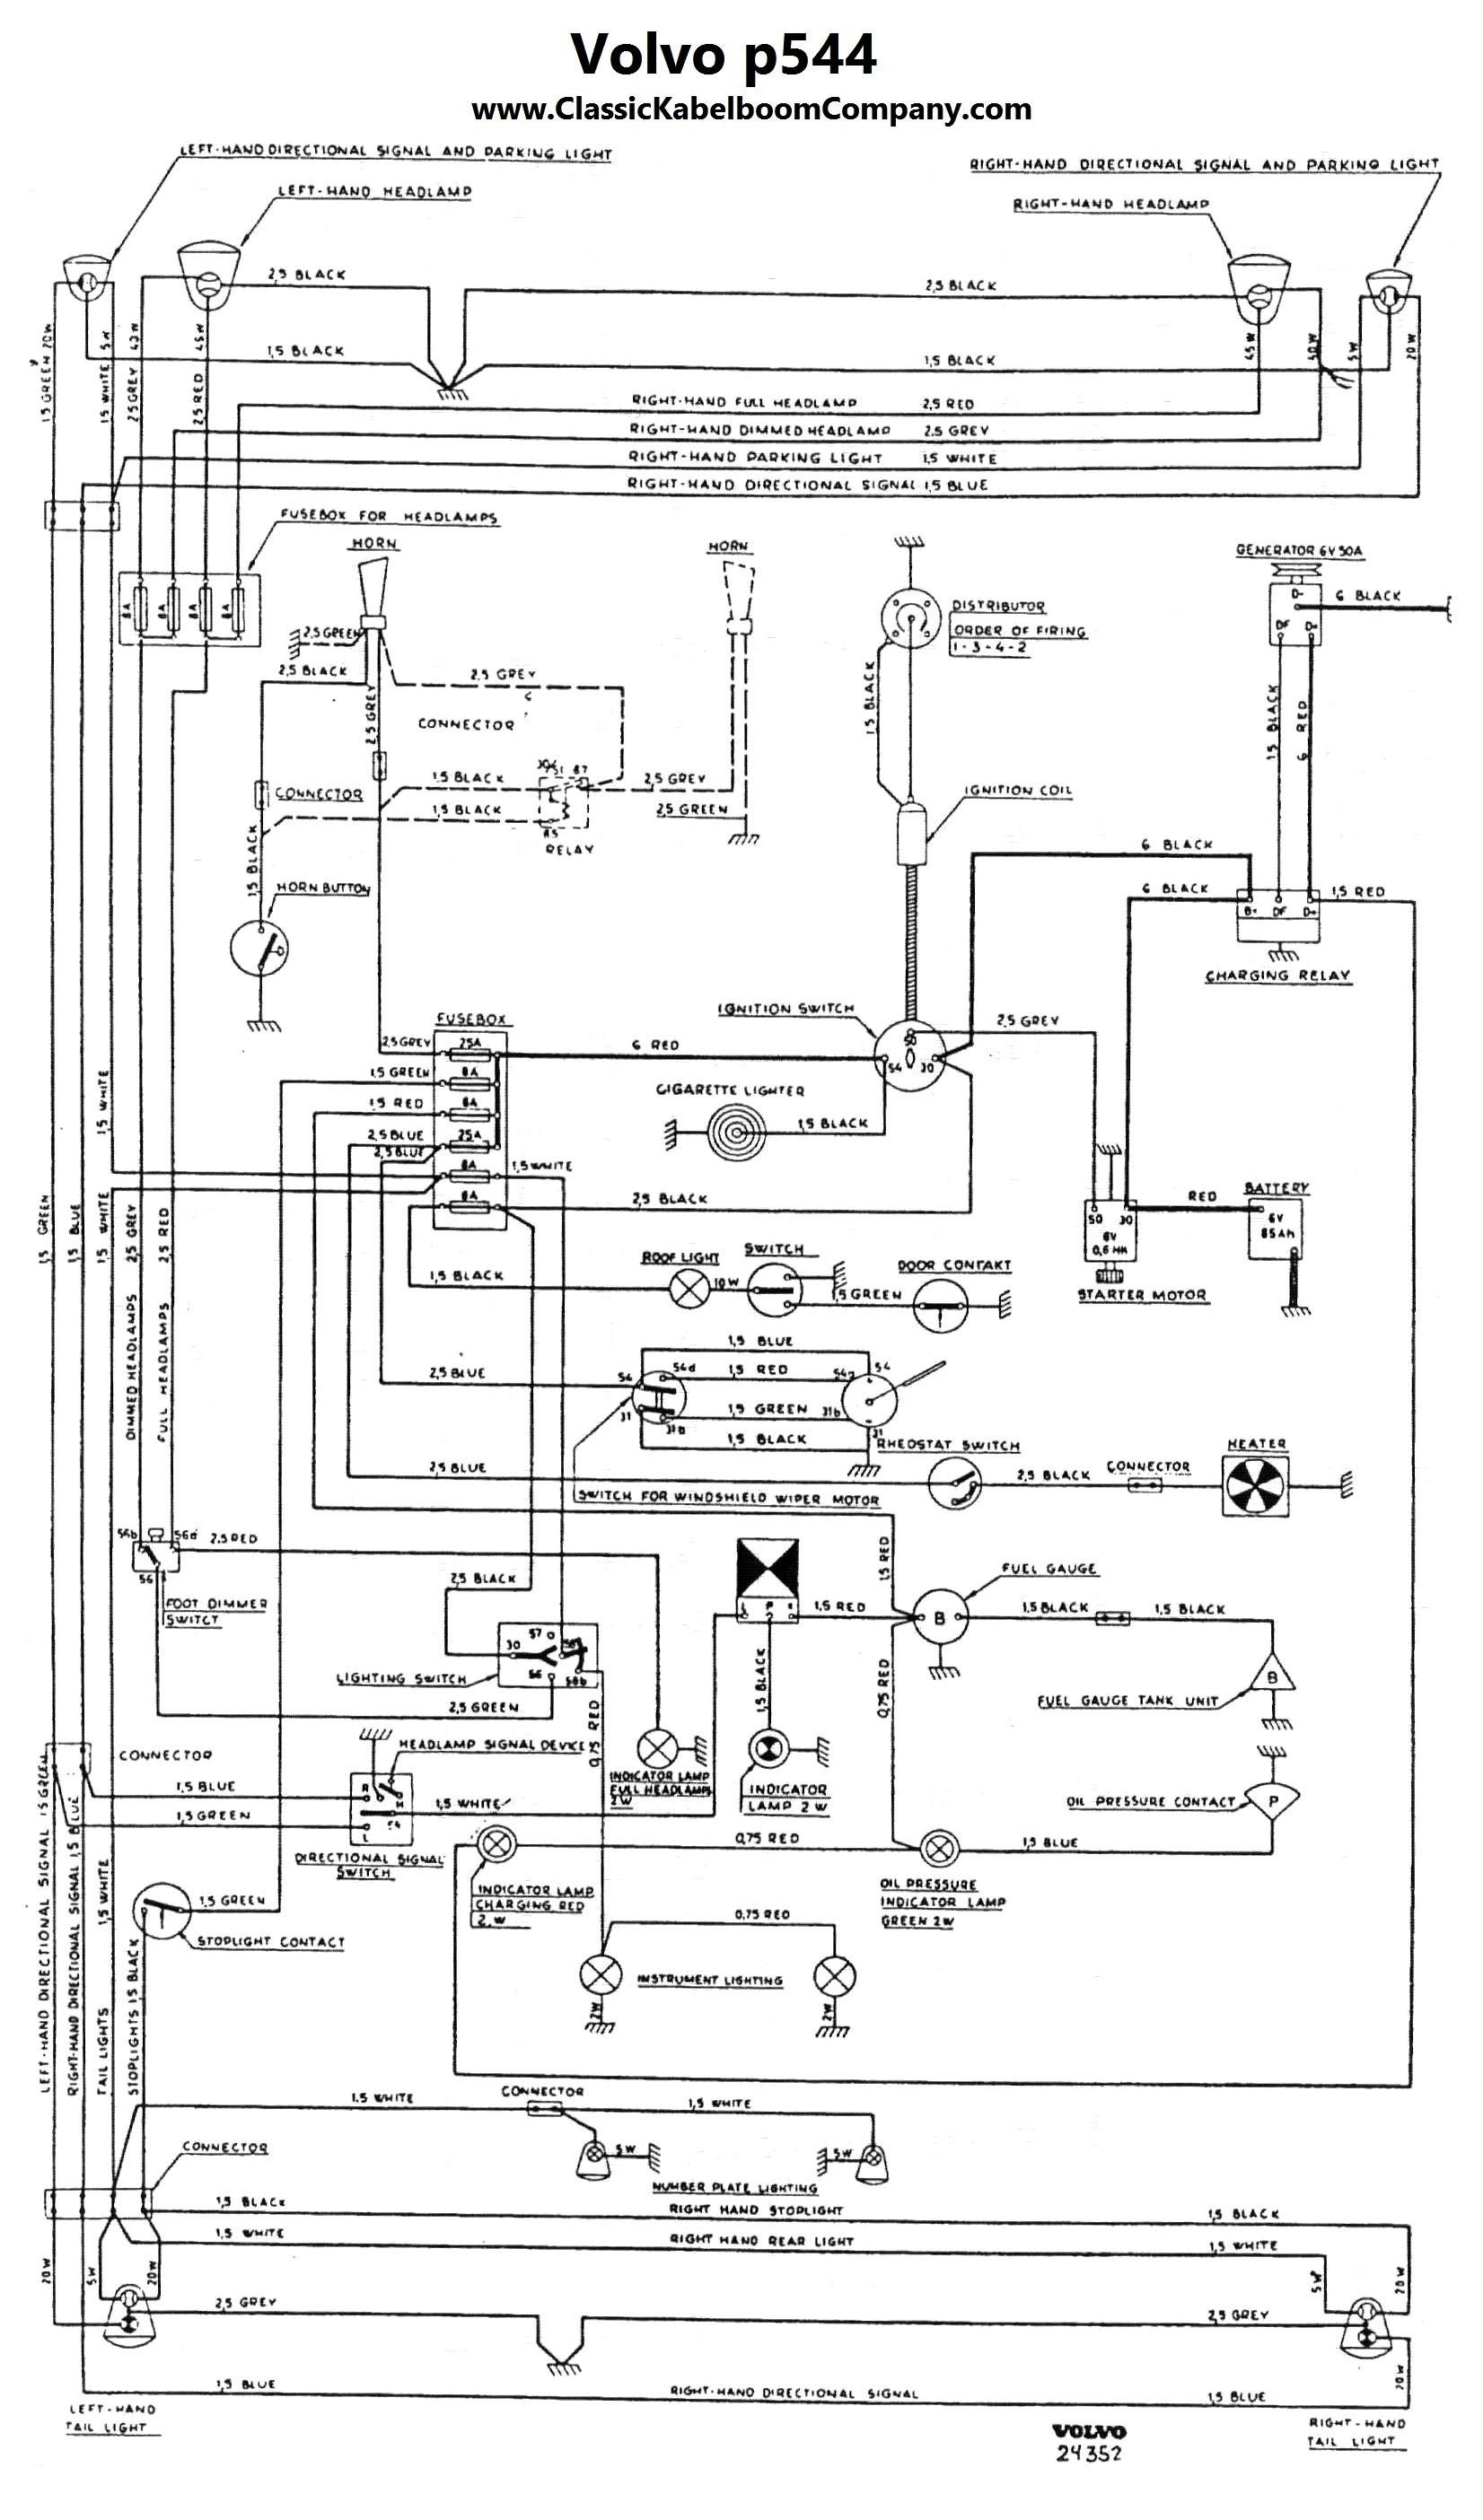 classic kabelboom company elektrisch bedrading schema volvo volvo pv544 katterug 1956 1957 1958 1959 1960 1961 1962 1963 1964 1965 electrical wiring diagram elektrisch bedrading schema